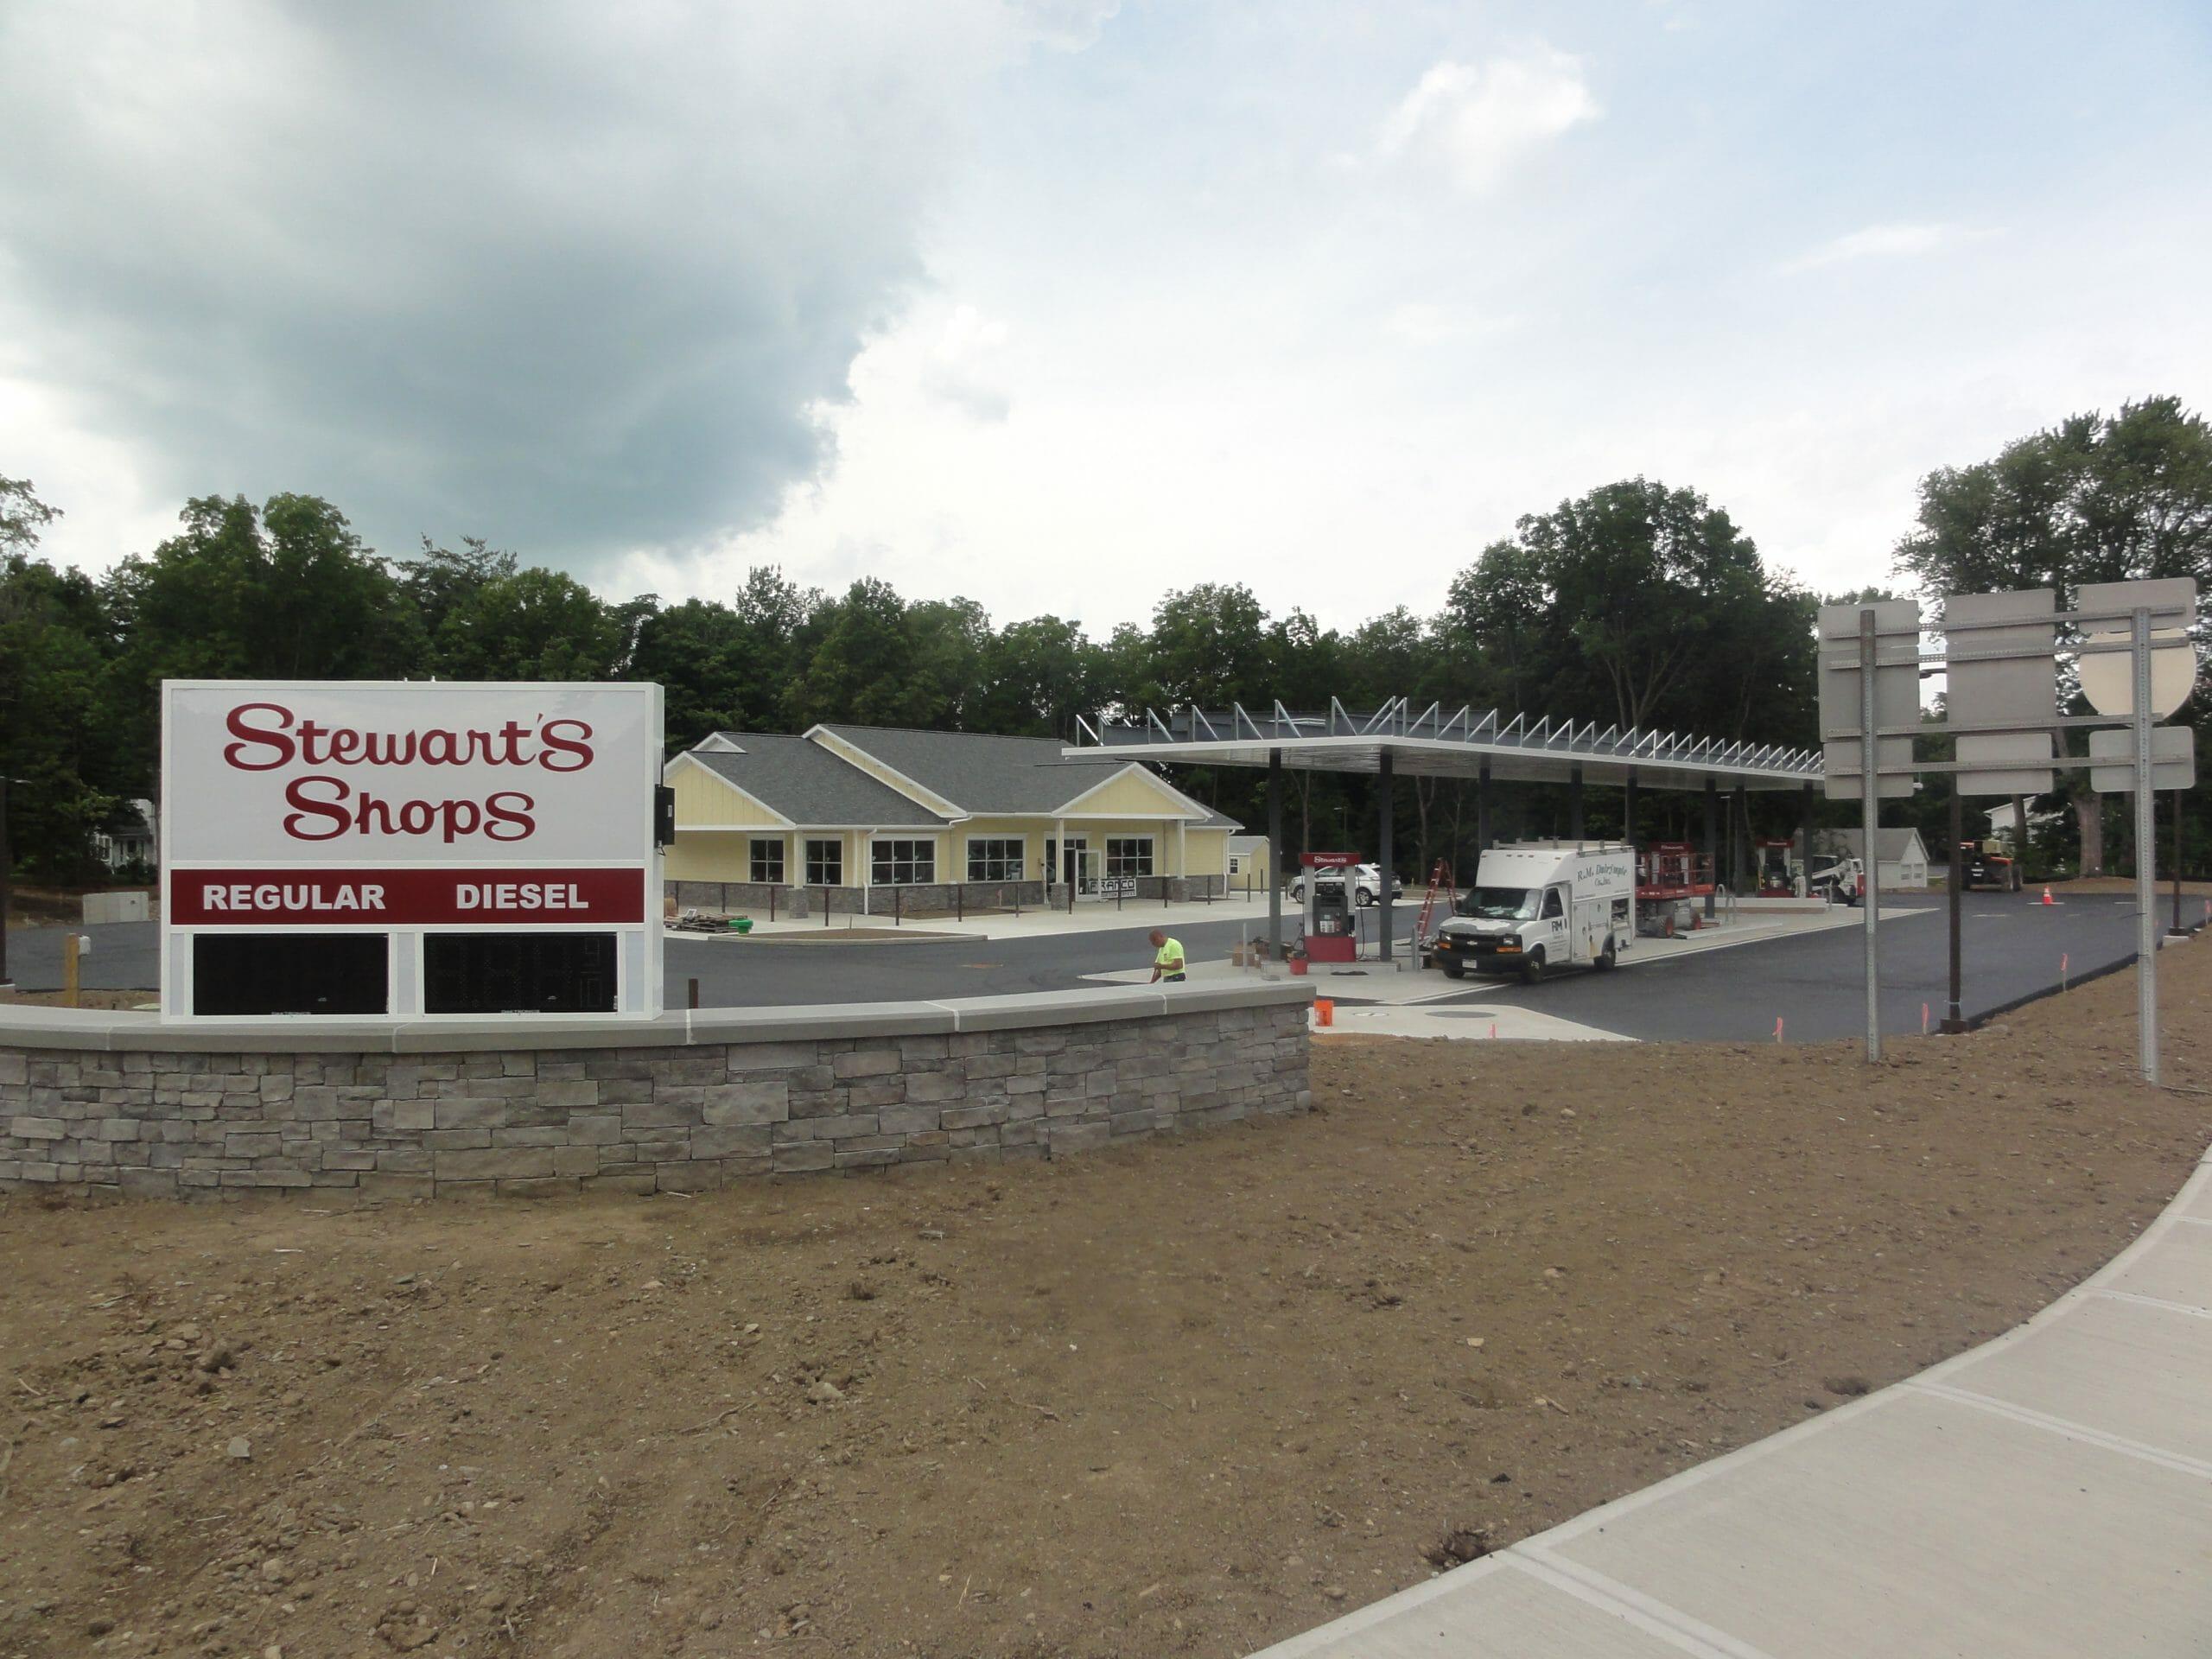 Shop under construction at Schodack